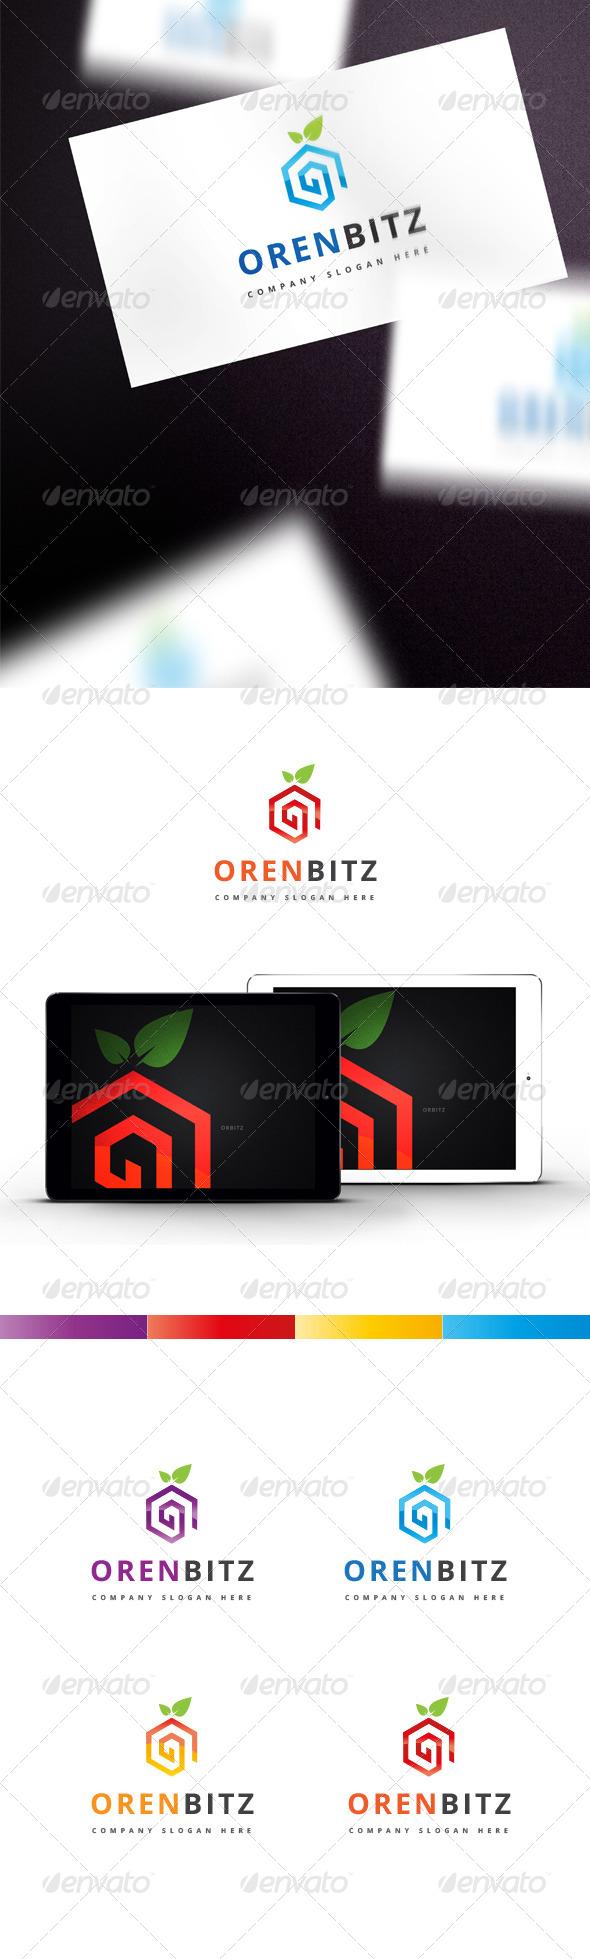 GraphicRiver Orenbitz Logo 7806253